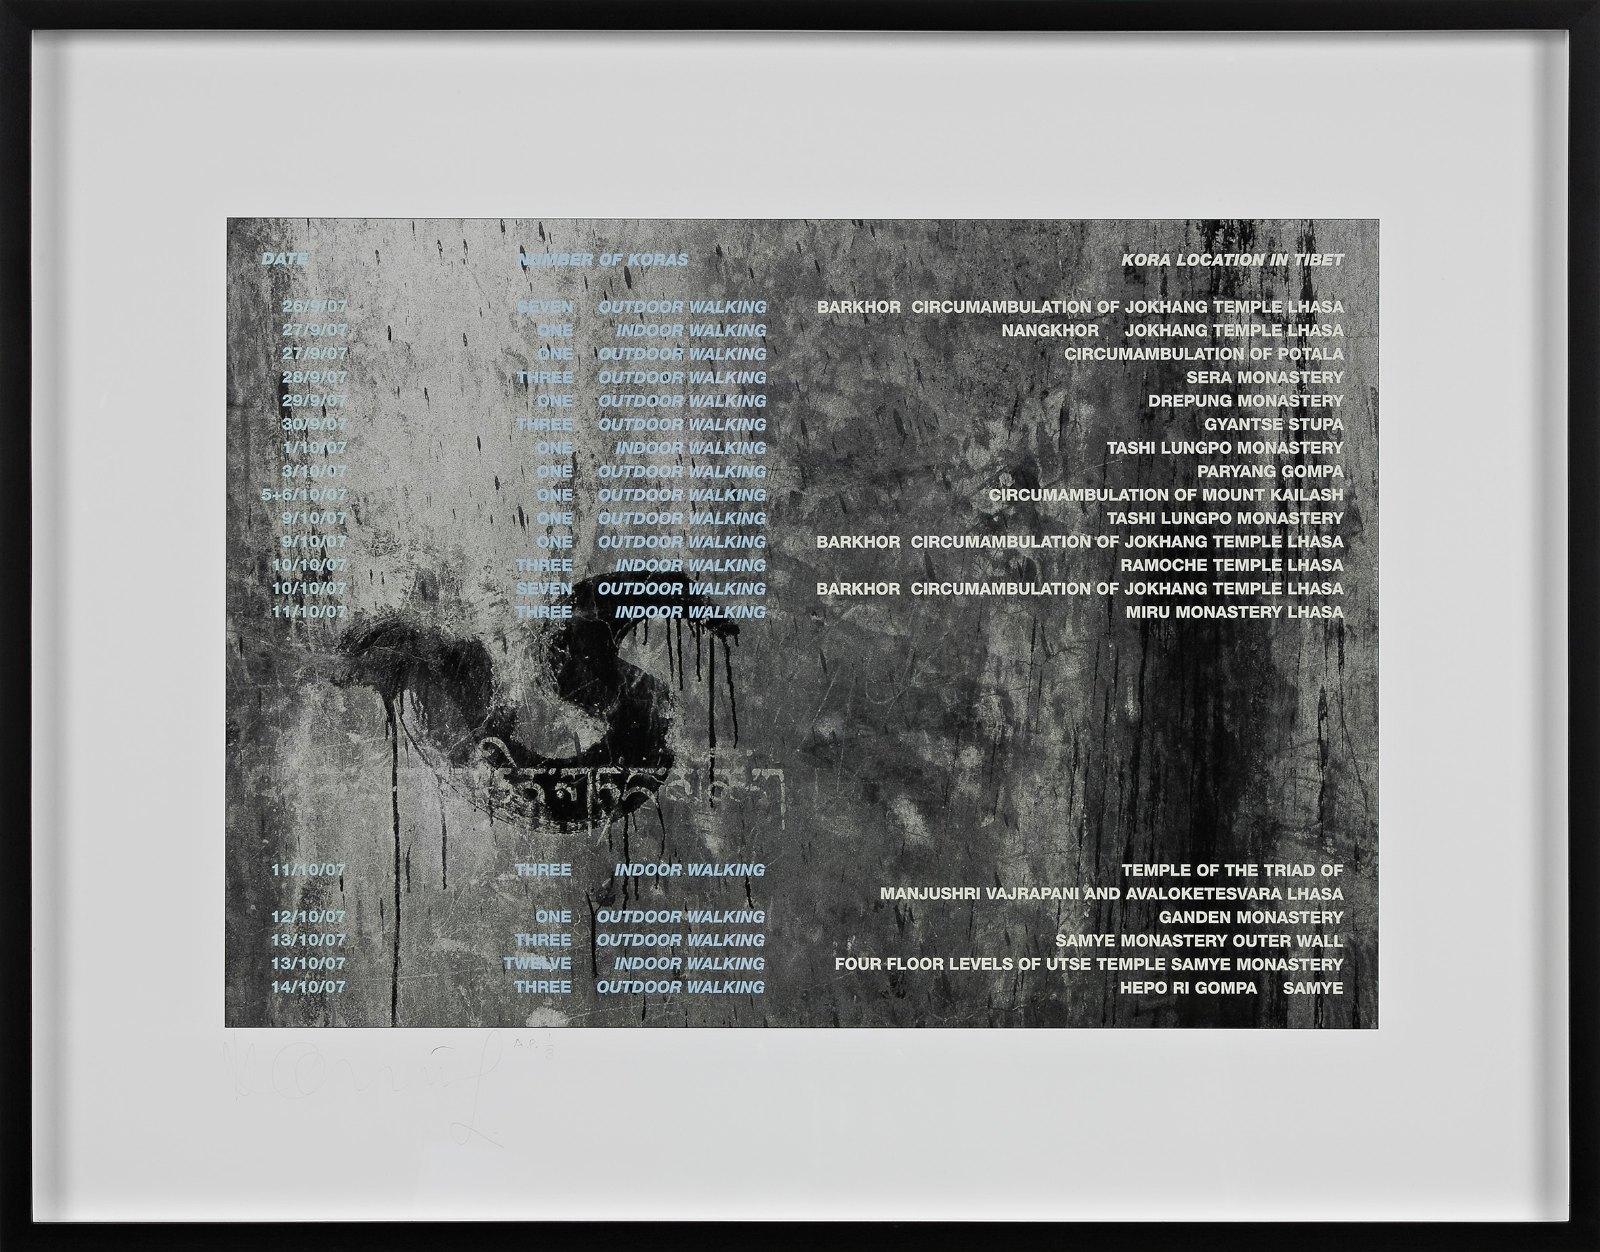 Kora List, 2007, iris print, 32.5 x 46.5 cm